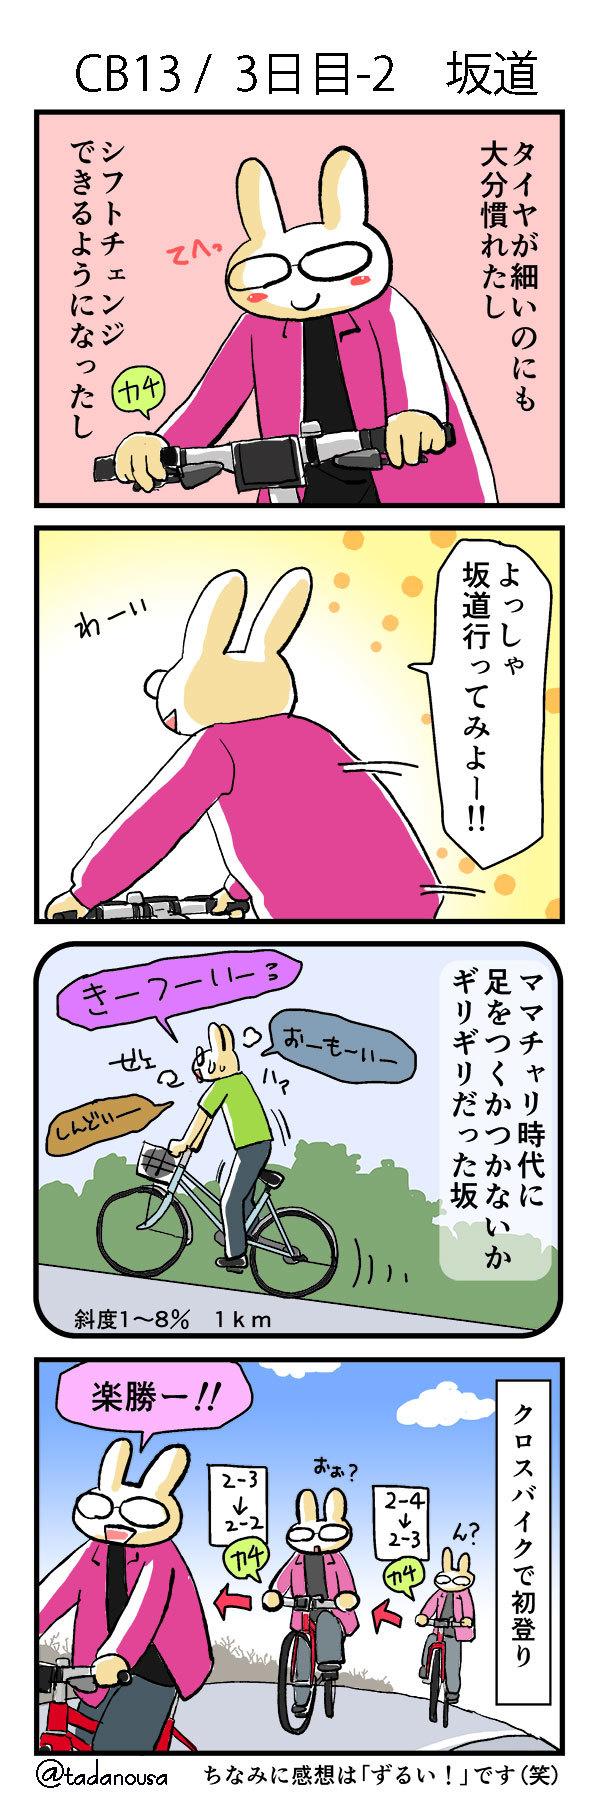 bike_4koma_kako053_s.jpg